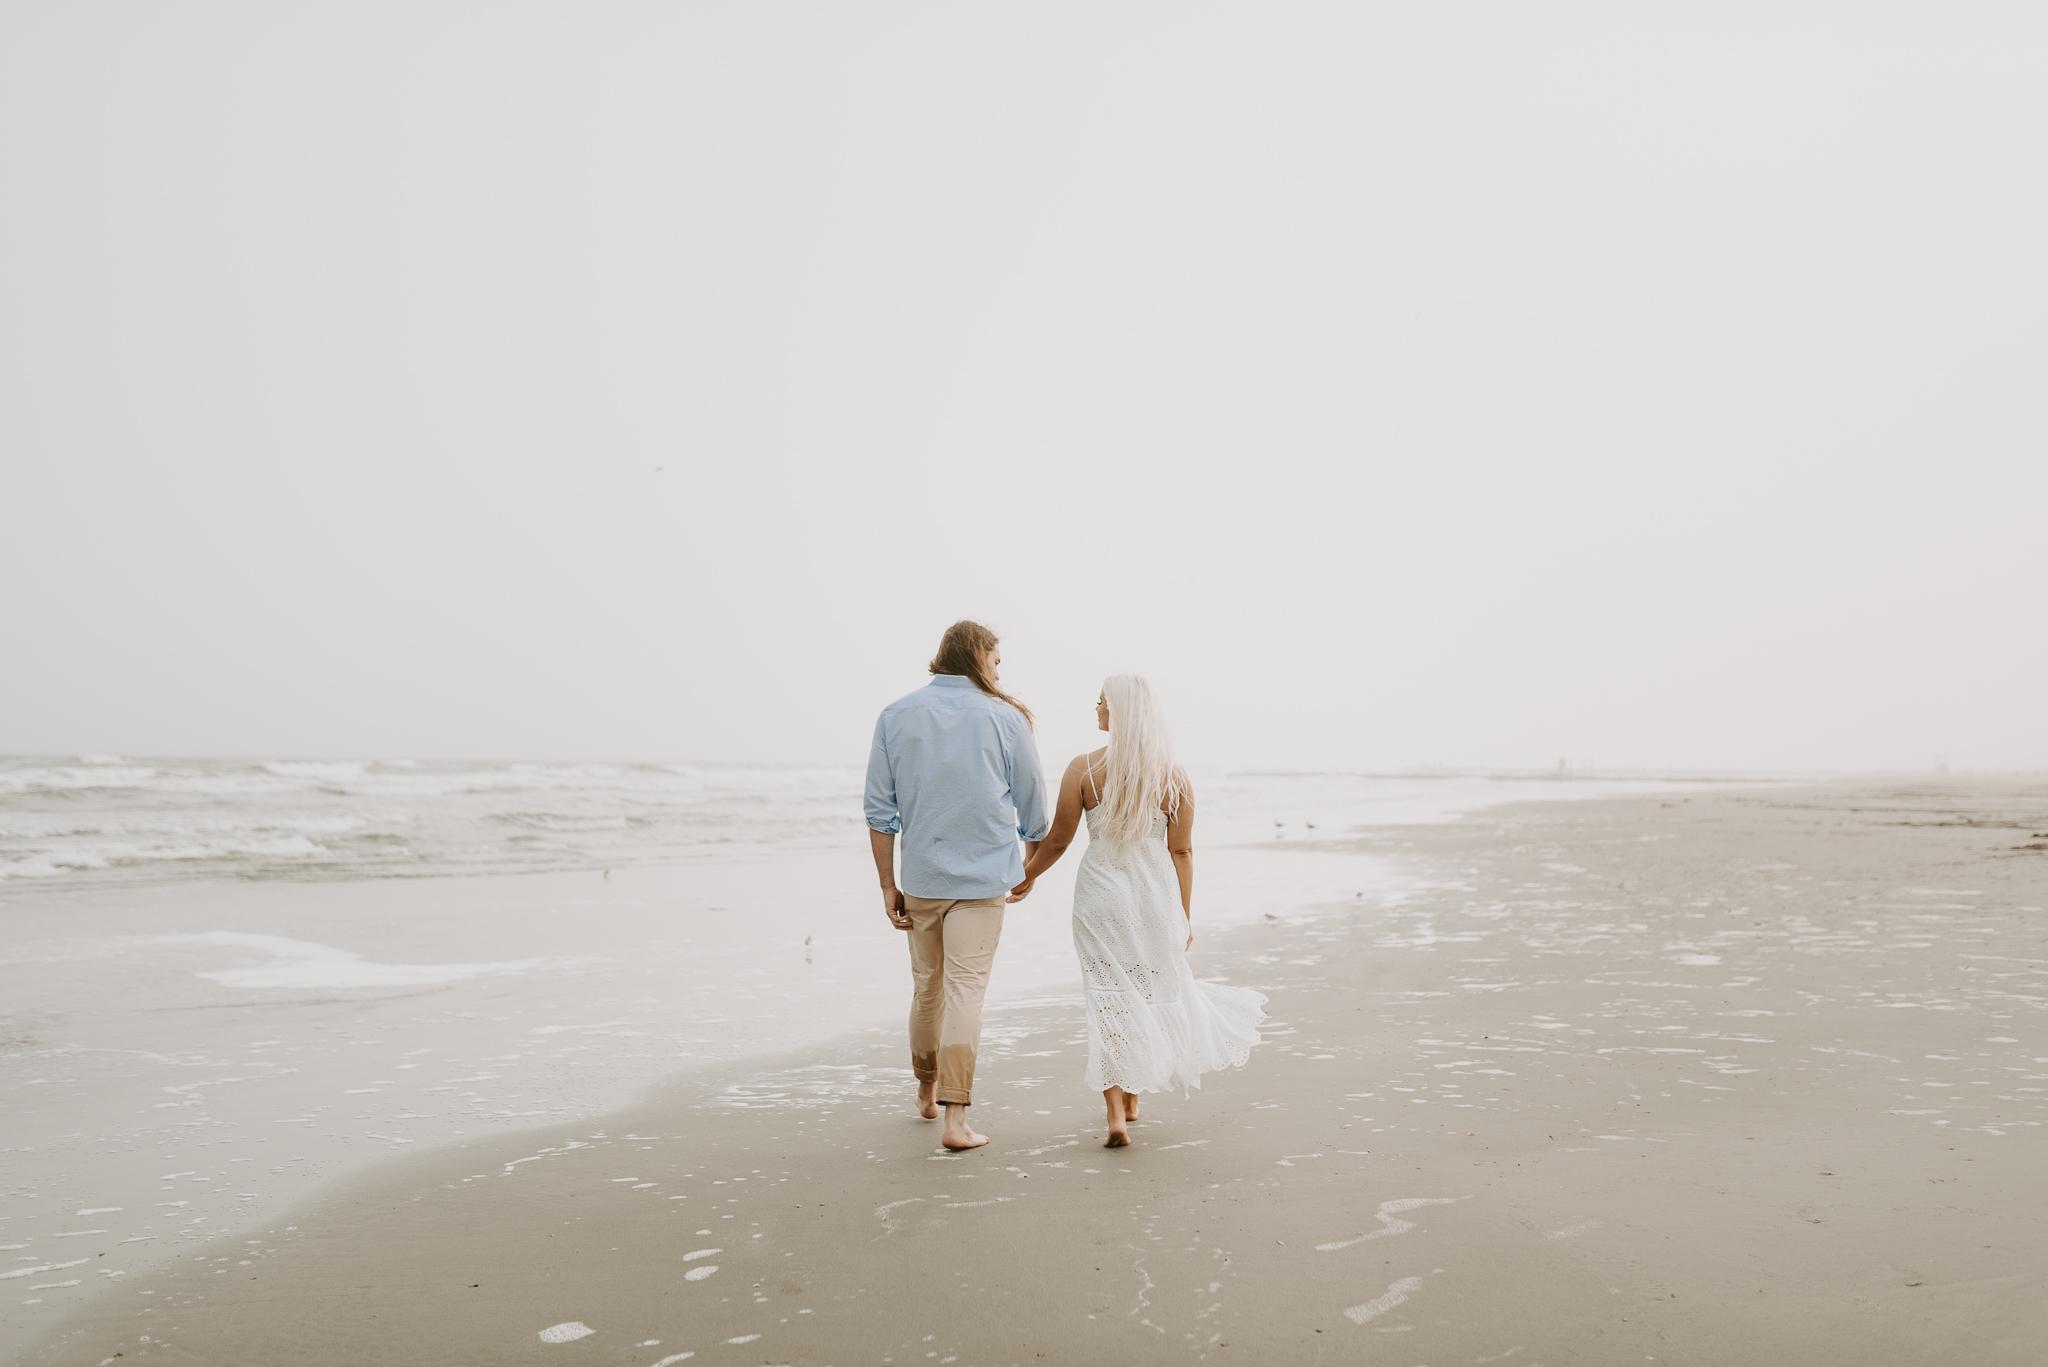 Ashley + Charles - Galveston Texas Moody Engagement Session | Kristen Giles Photography - 023.jpg